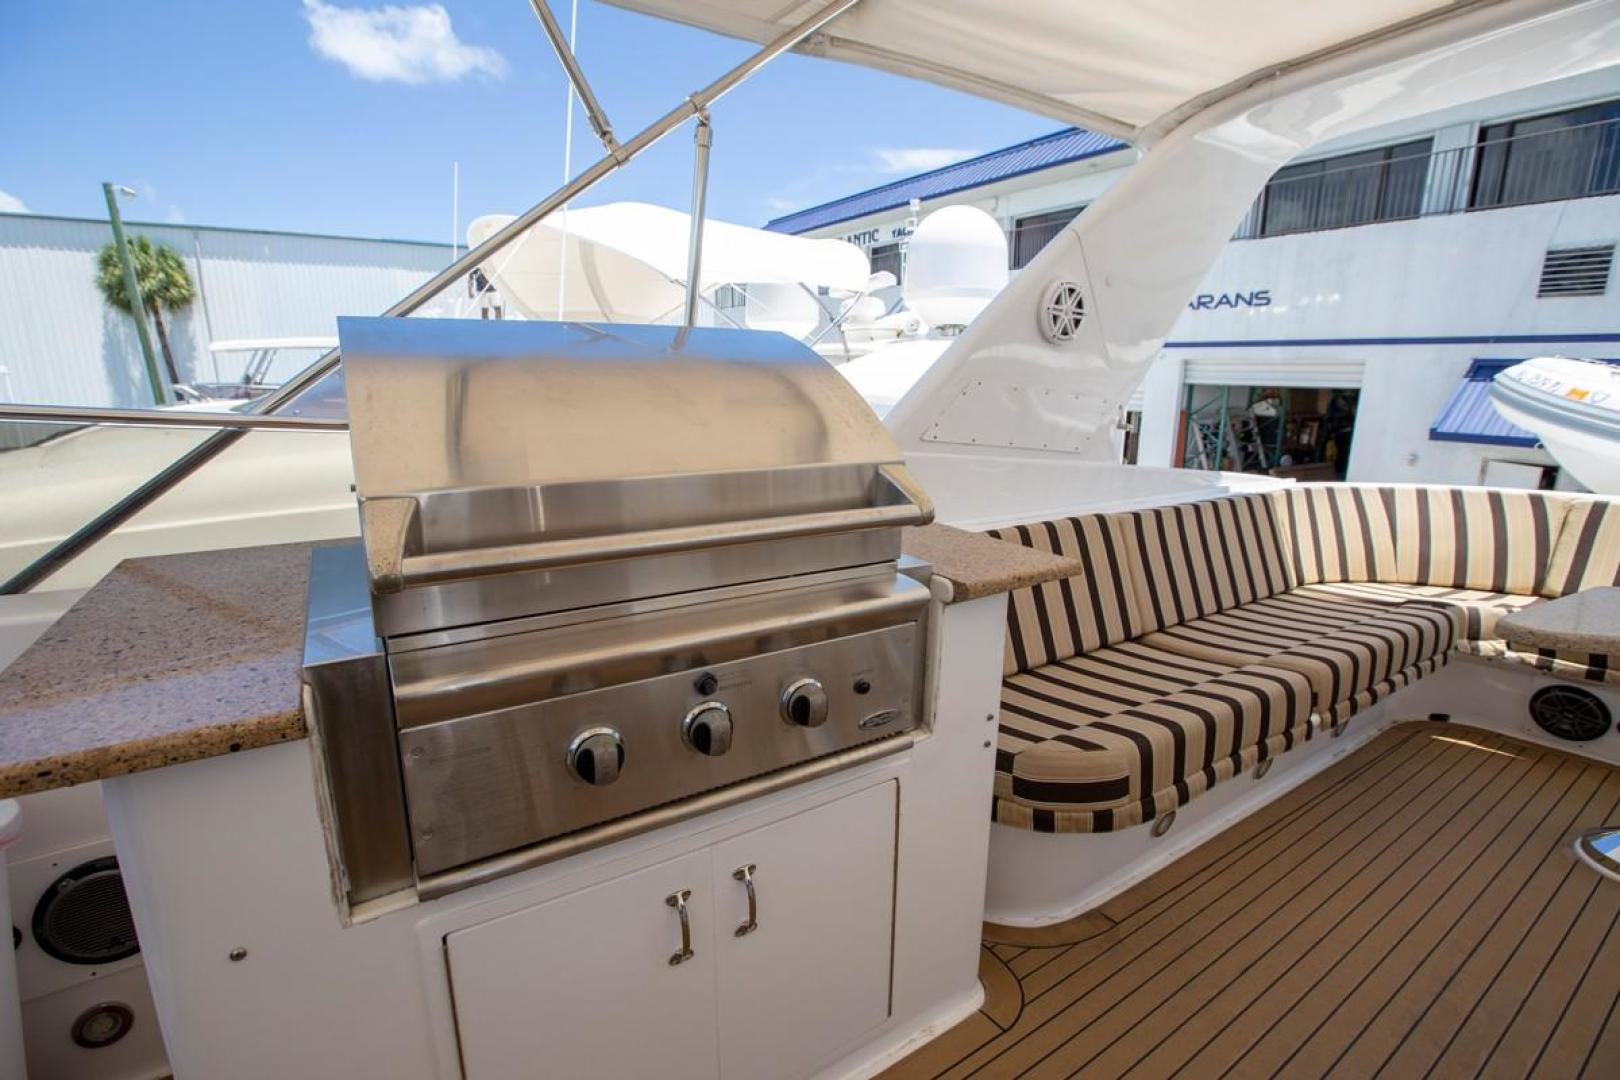 Hatteras-Cockpit Motor Yacht 2000-Getaway Ft. Lauderdale-Florida-United States-977397 | Thumbnail